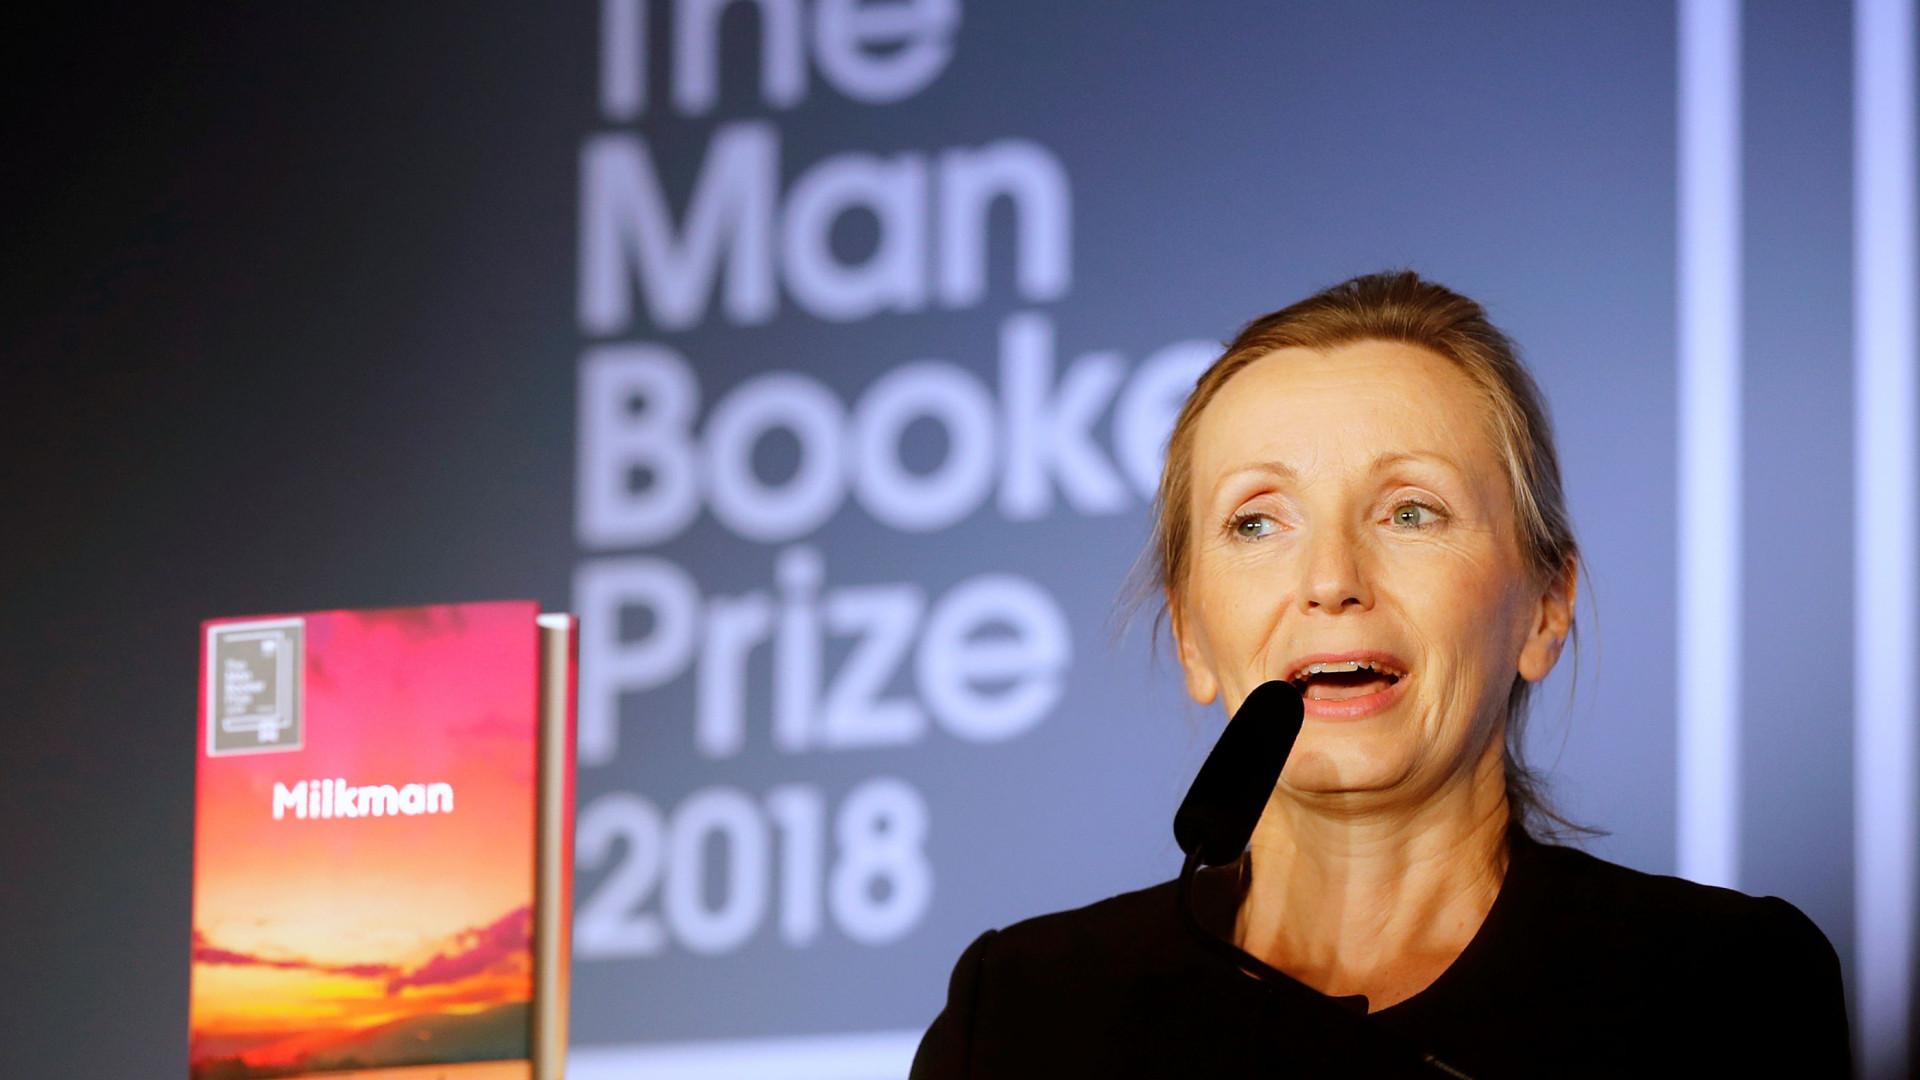 Anna Burns vence Man Booker Prize com 'Milkman'